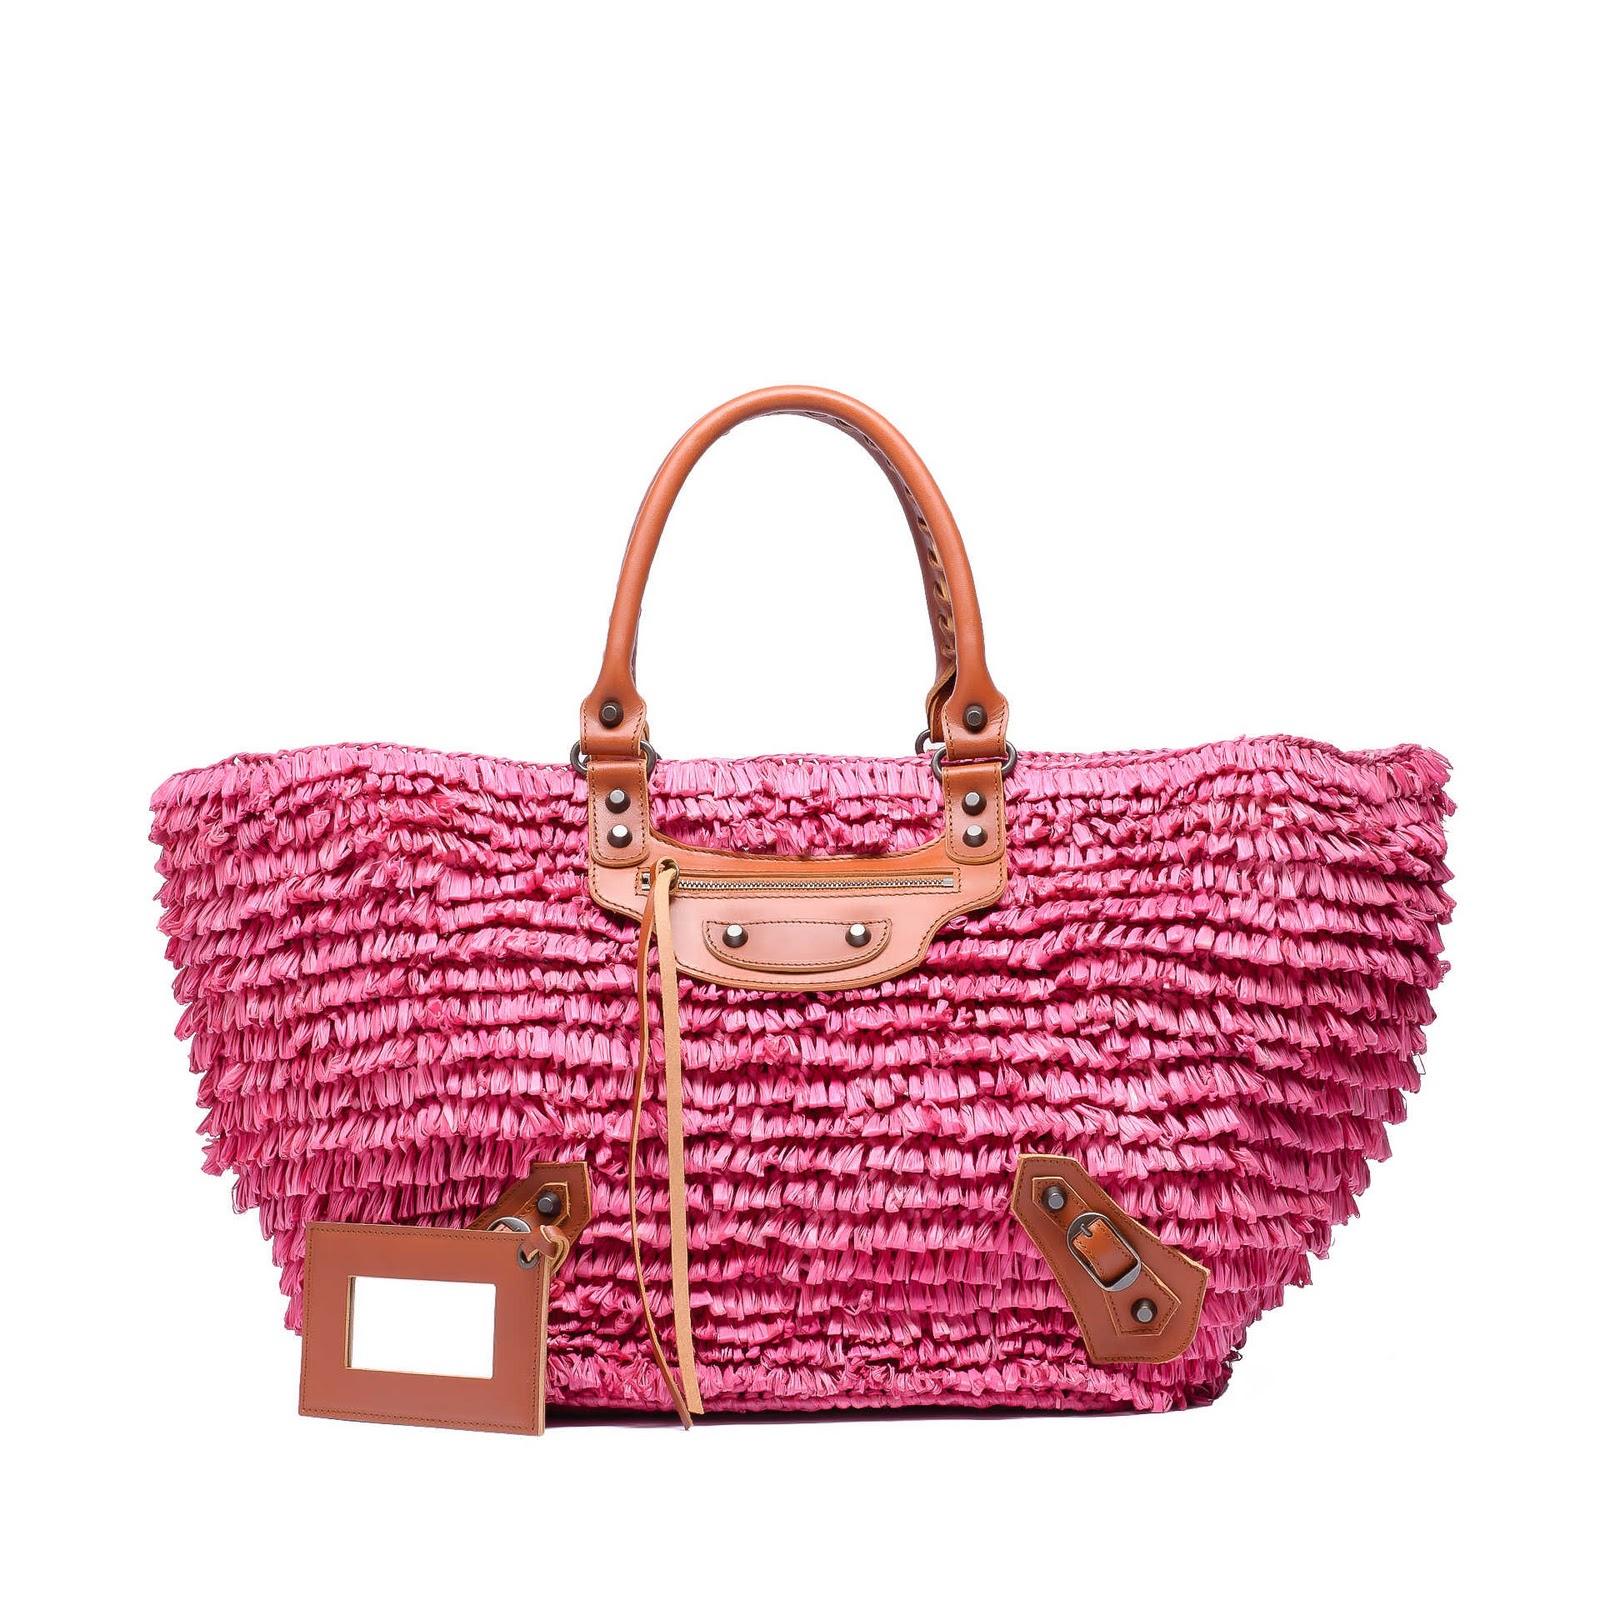 http://4.bp.blogspot.com/-CIODUvvznNk/TwglNfncZYI/AAAAAAAAICg/erZuAU1xlOk/s1600/286992_G5BNK_5860_A-pink-balenciaga-basket-l-raffia-hawai-handbags-1920x1920.jpg